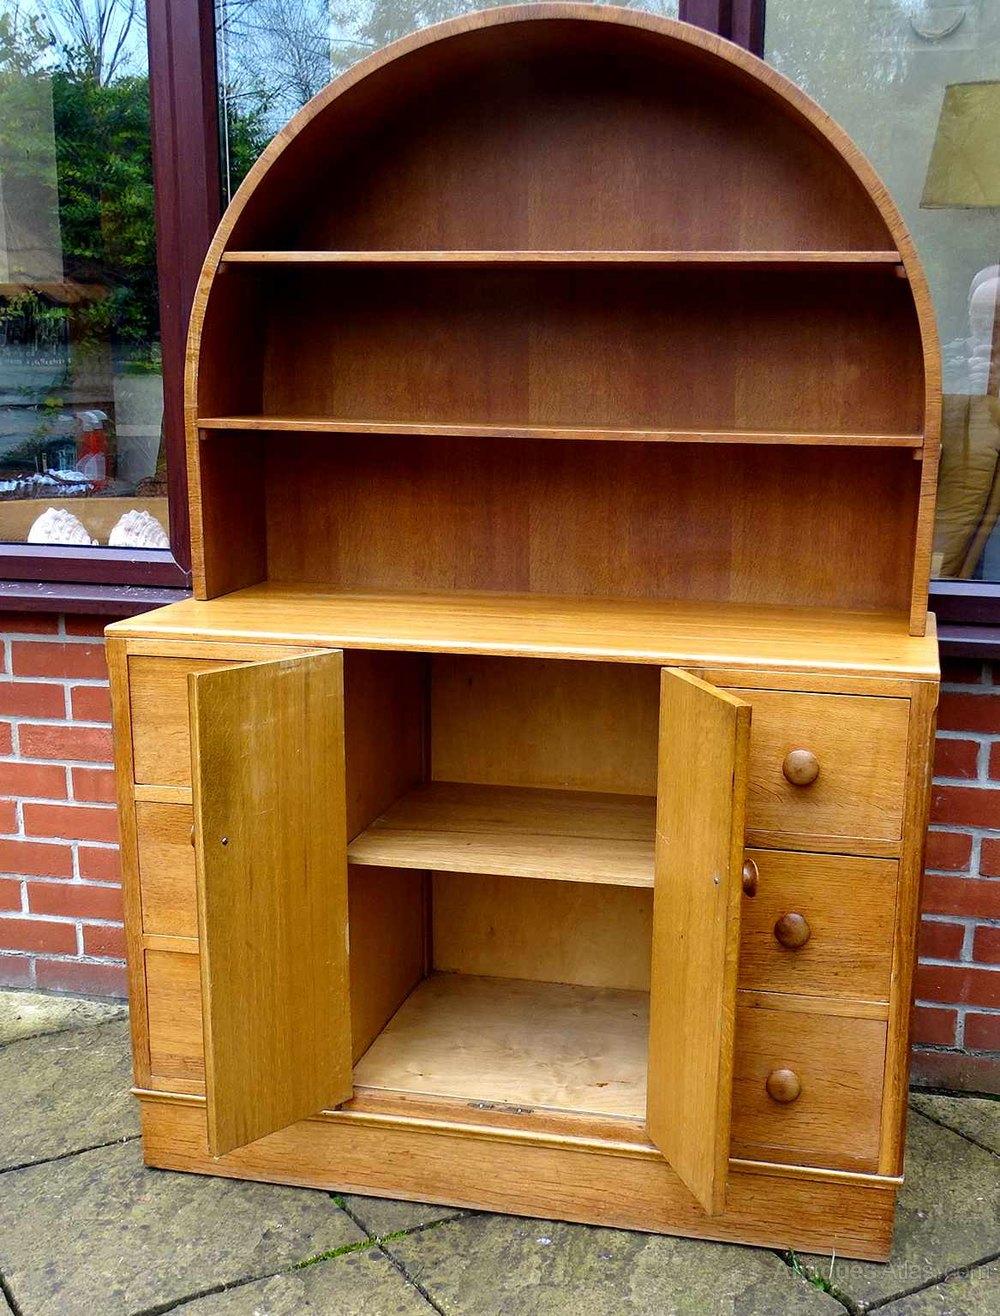 As160a805 on Quarter Sawn Oak Dresser